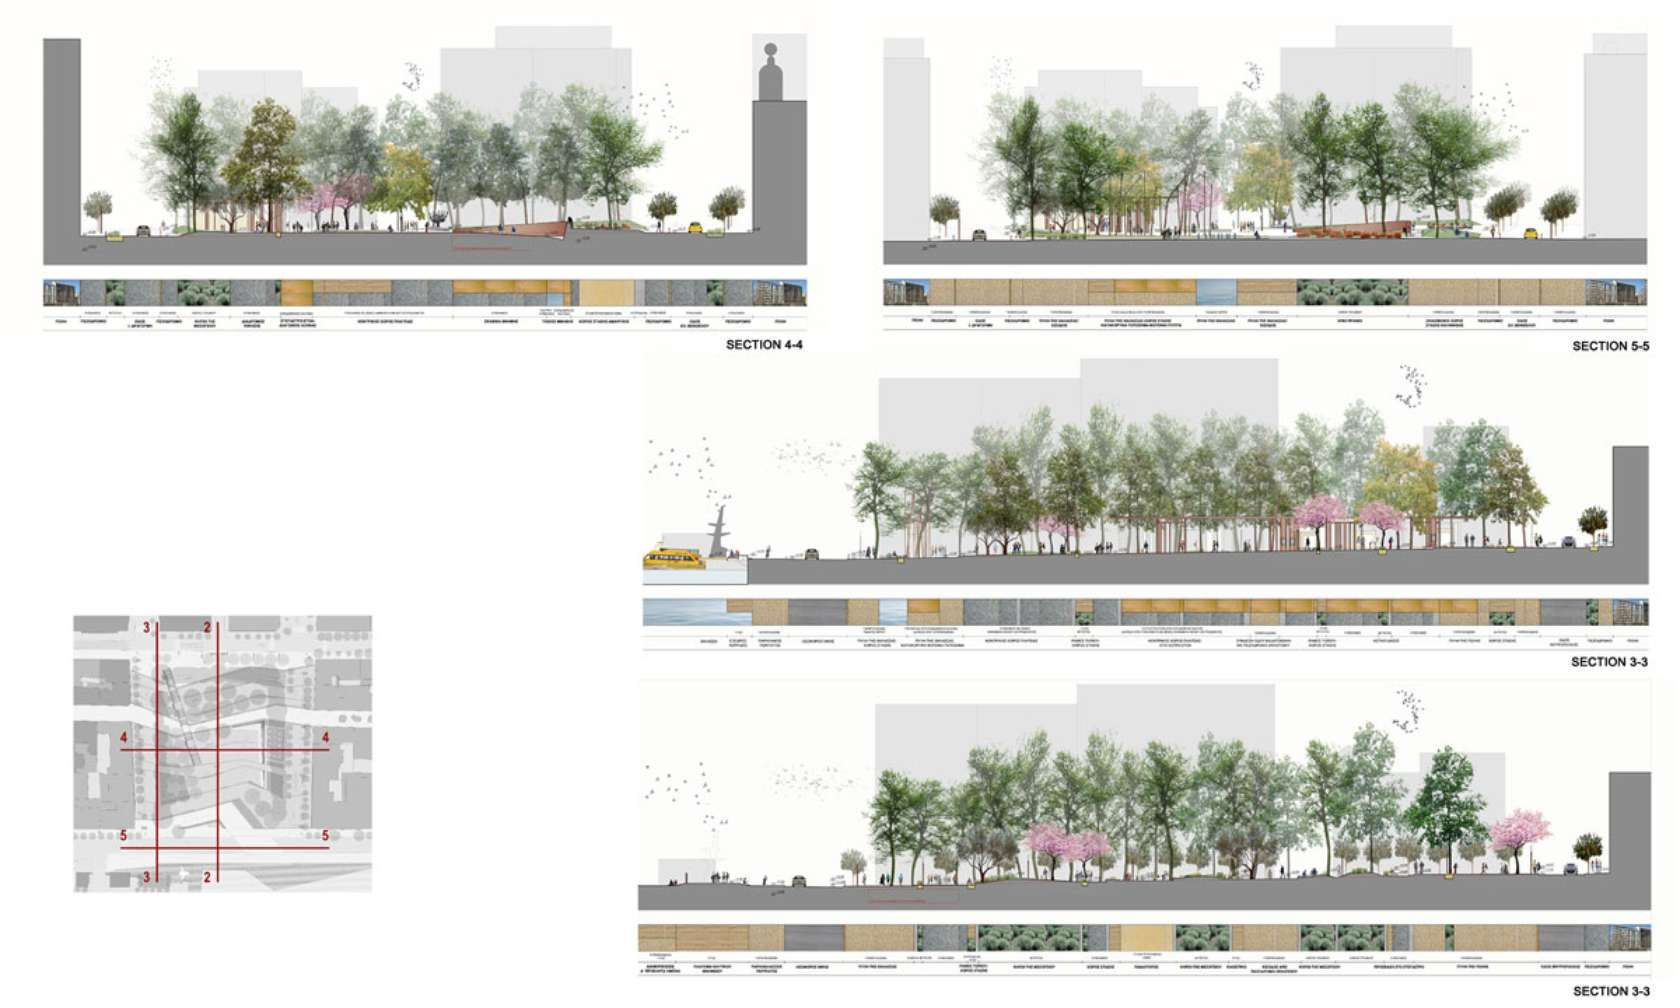 Thanasis Polyzoidis on Architizer Landscape architecture